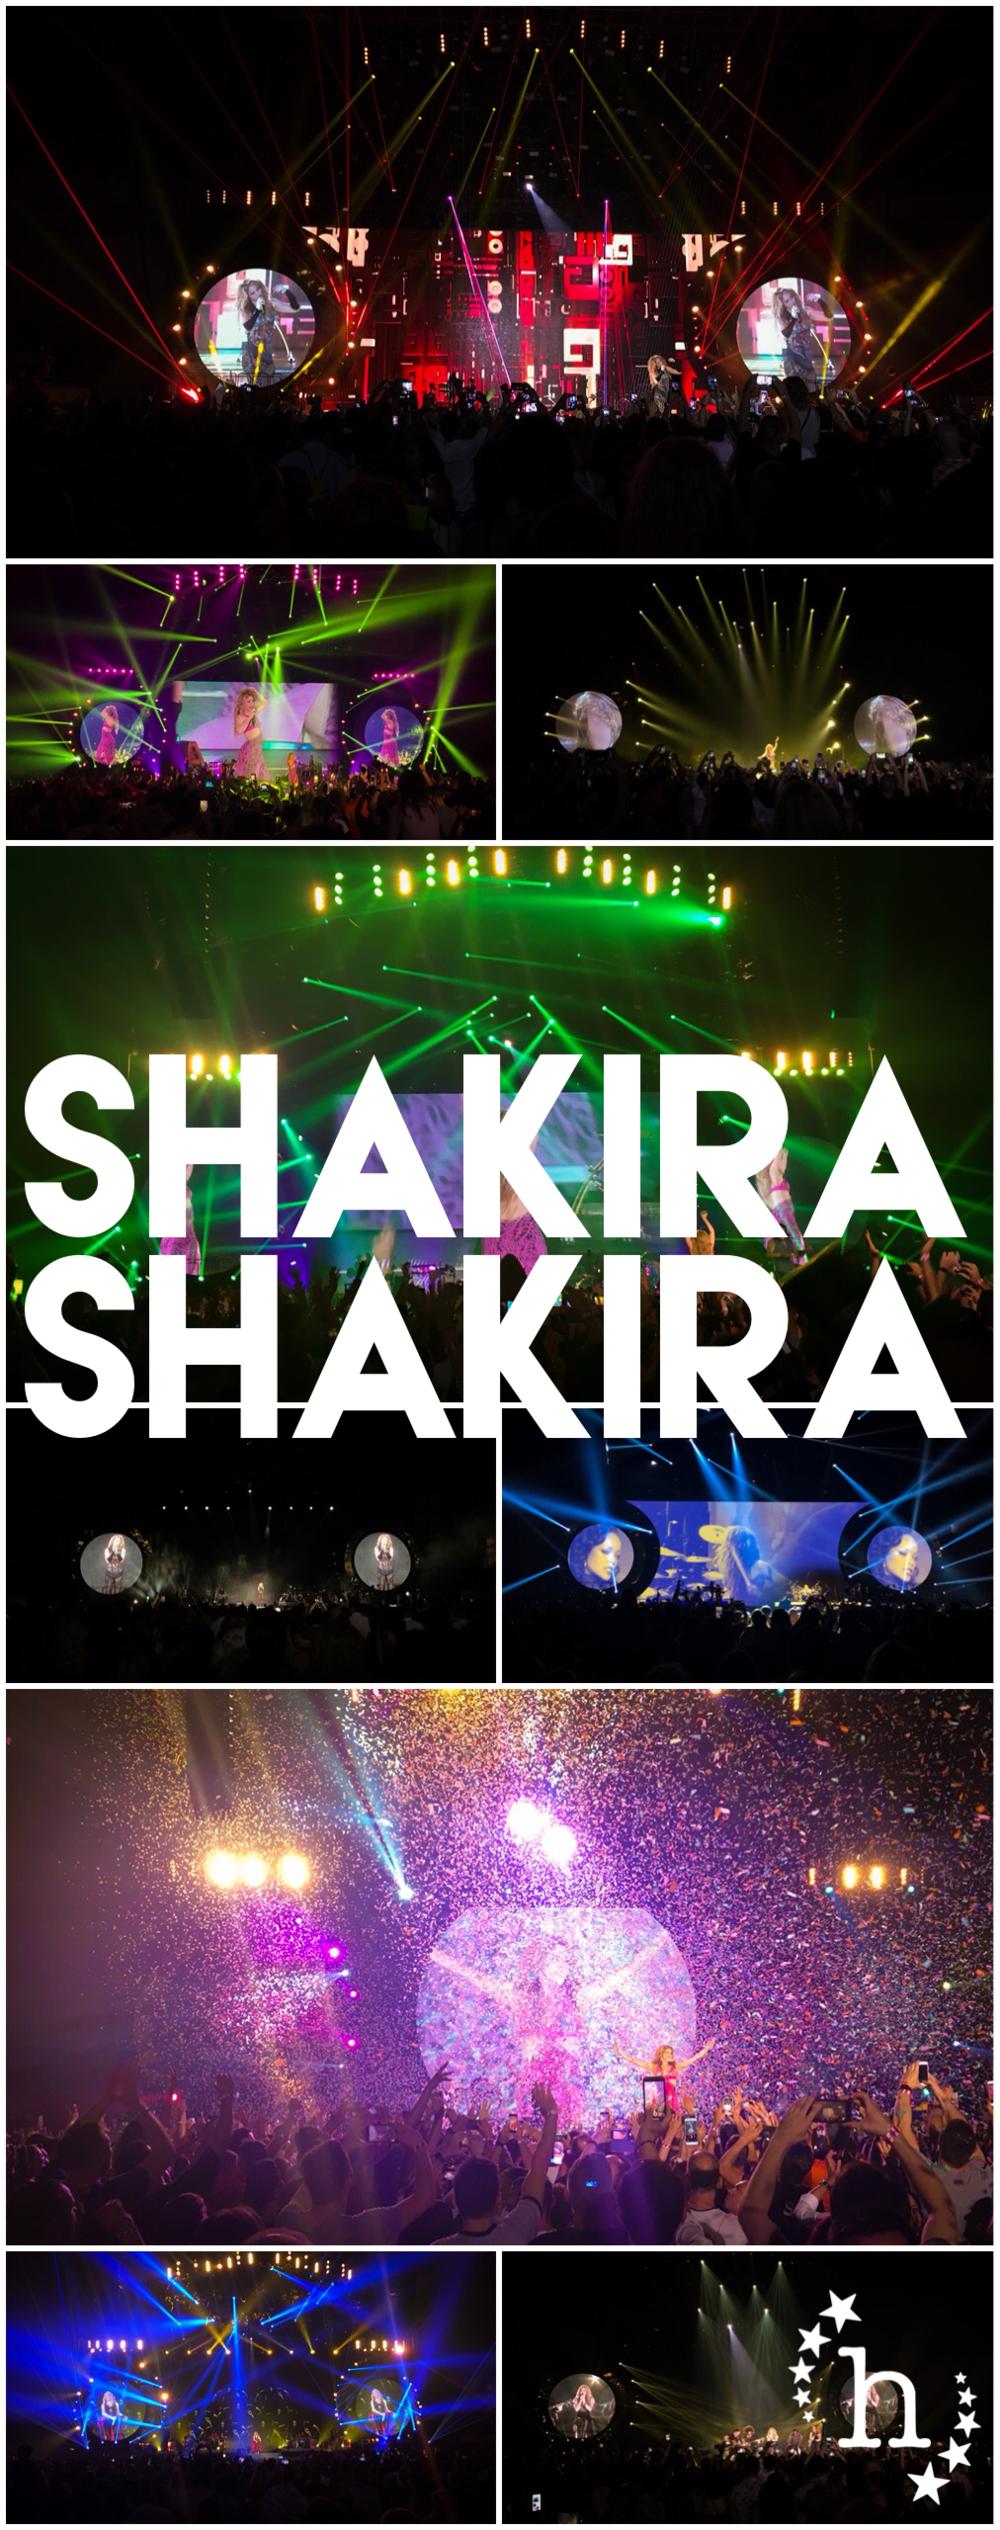 Shakira Shakira - hefafa.me.uk